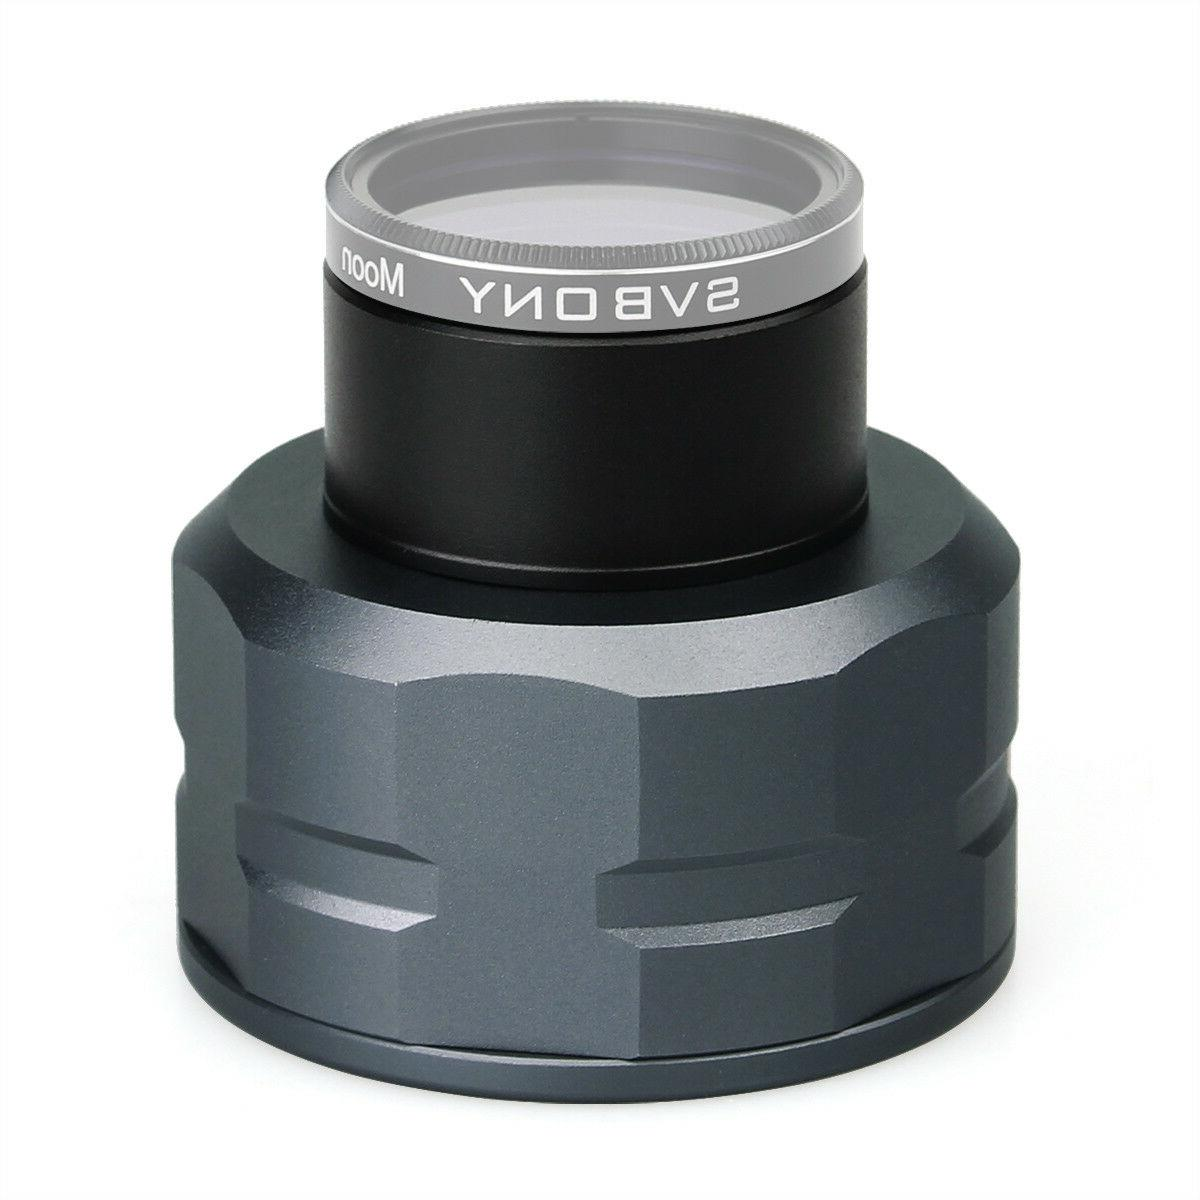 SVBONY Telescopes Electronic Eyepieces Camera